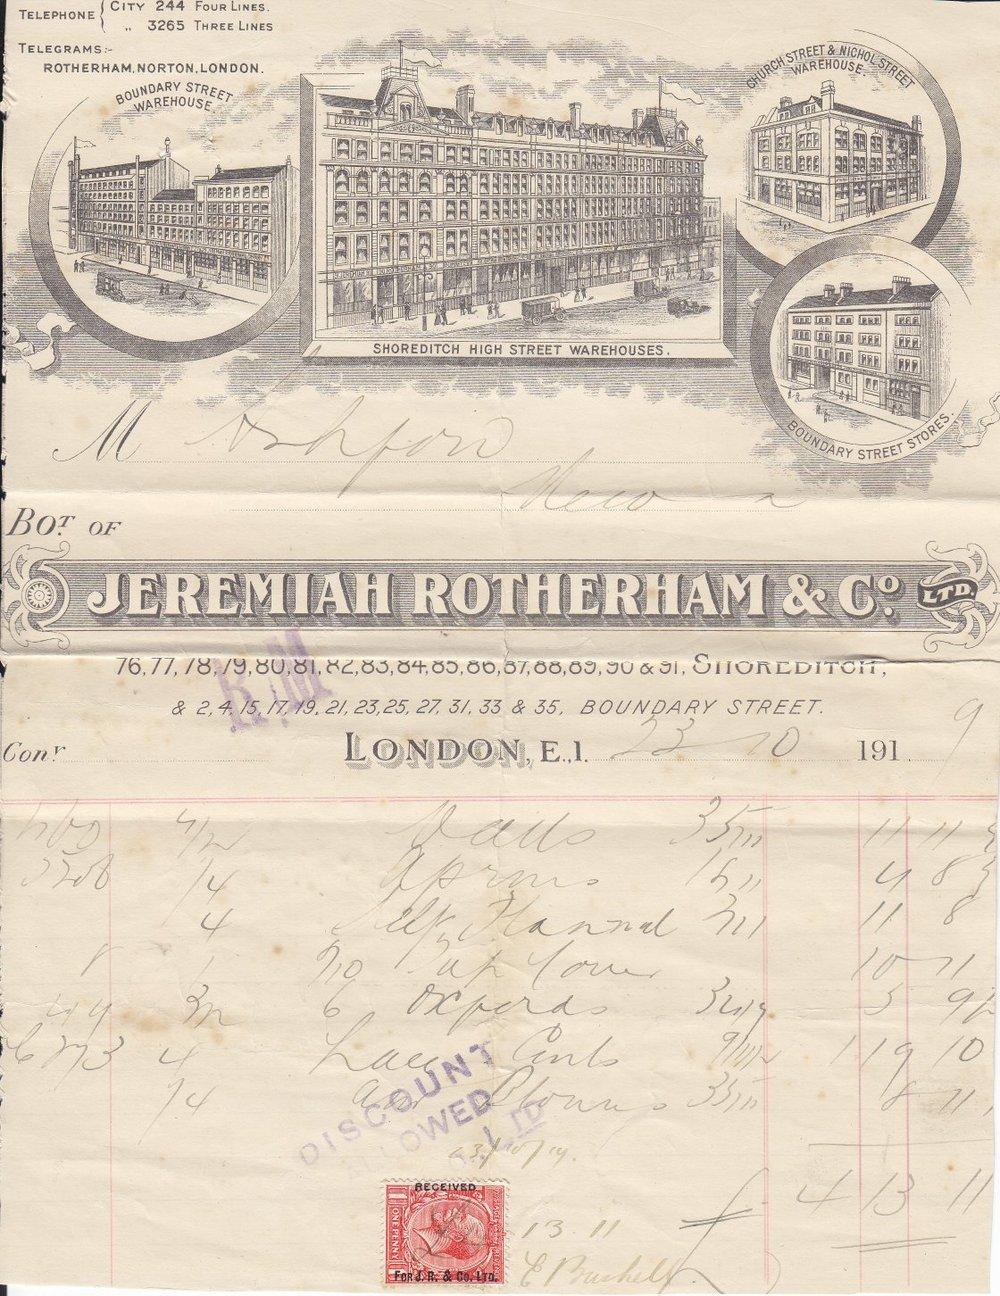 Jeremiah Rotherham paper.jpg